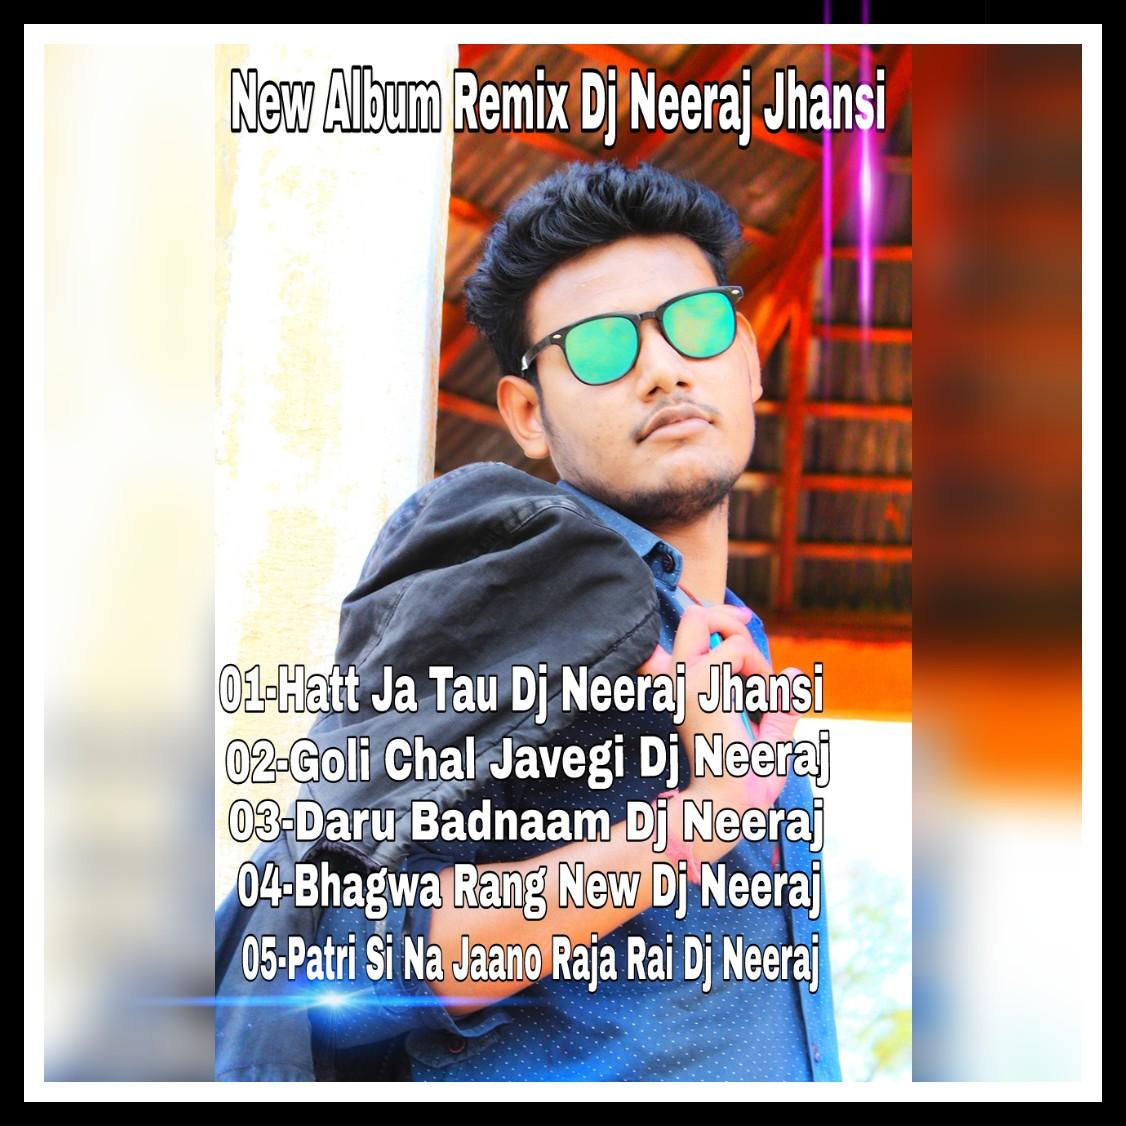 Bhagwa Rang Dj: Dj Neeraj Jhansi 7084499951